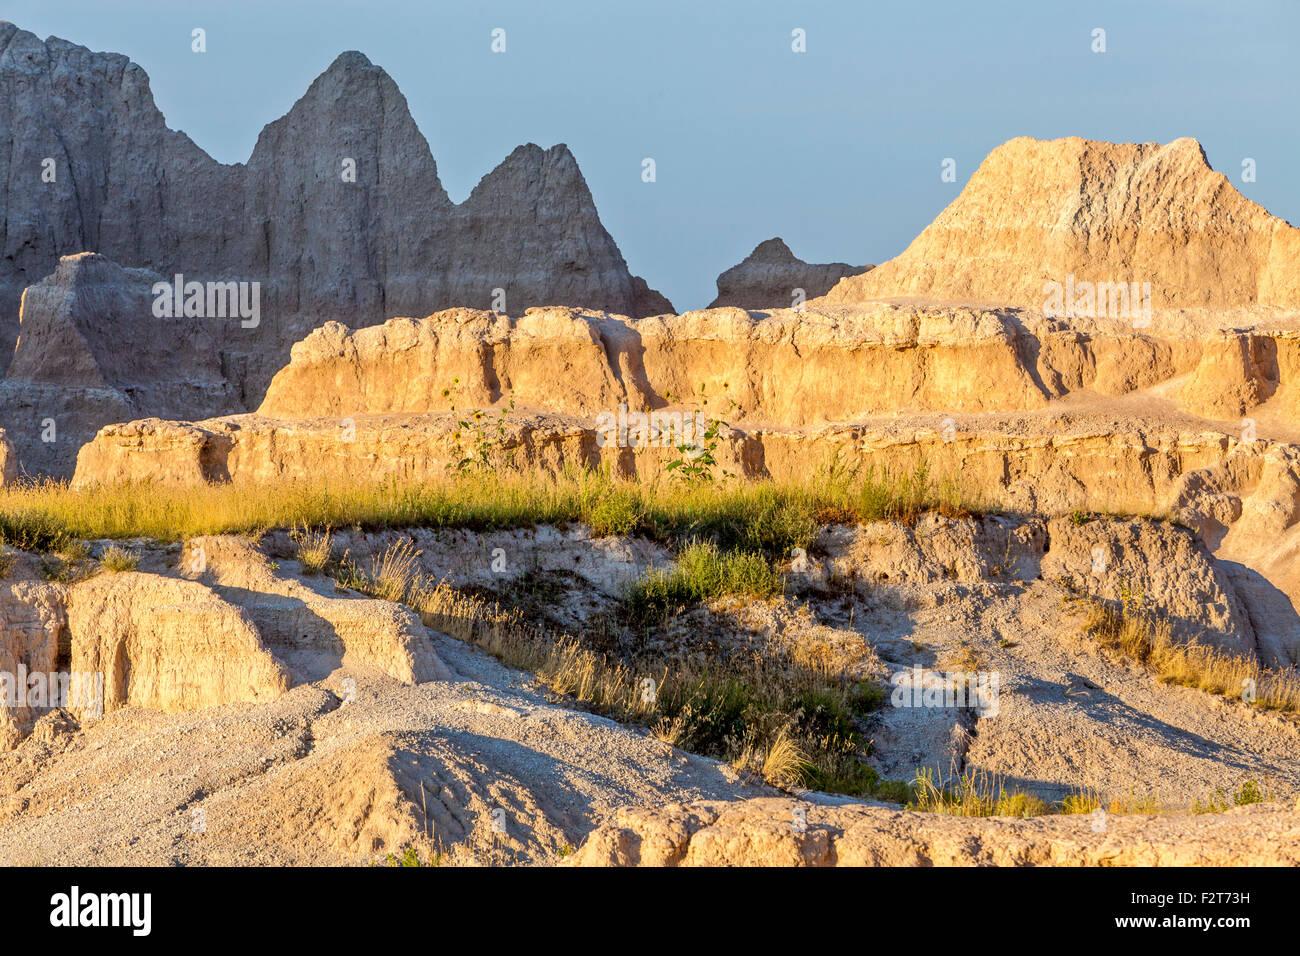 A view of the Badlands National Park, South Dakota. - Stock Image